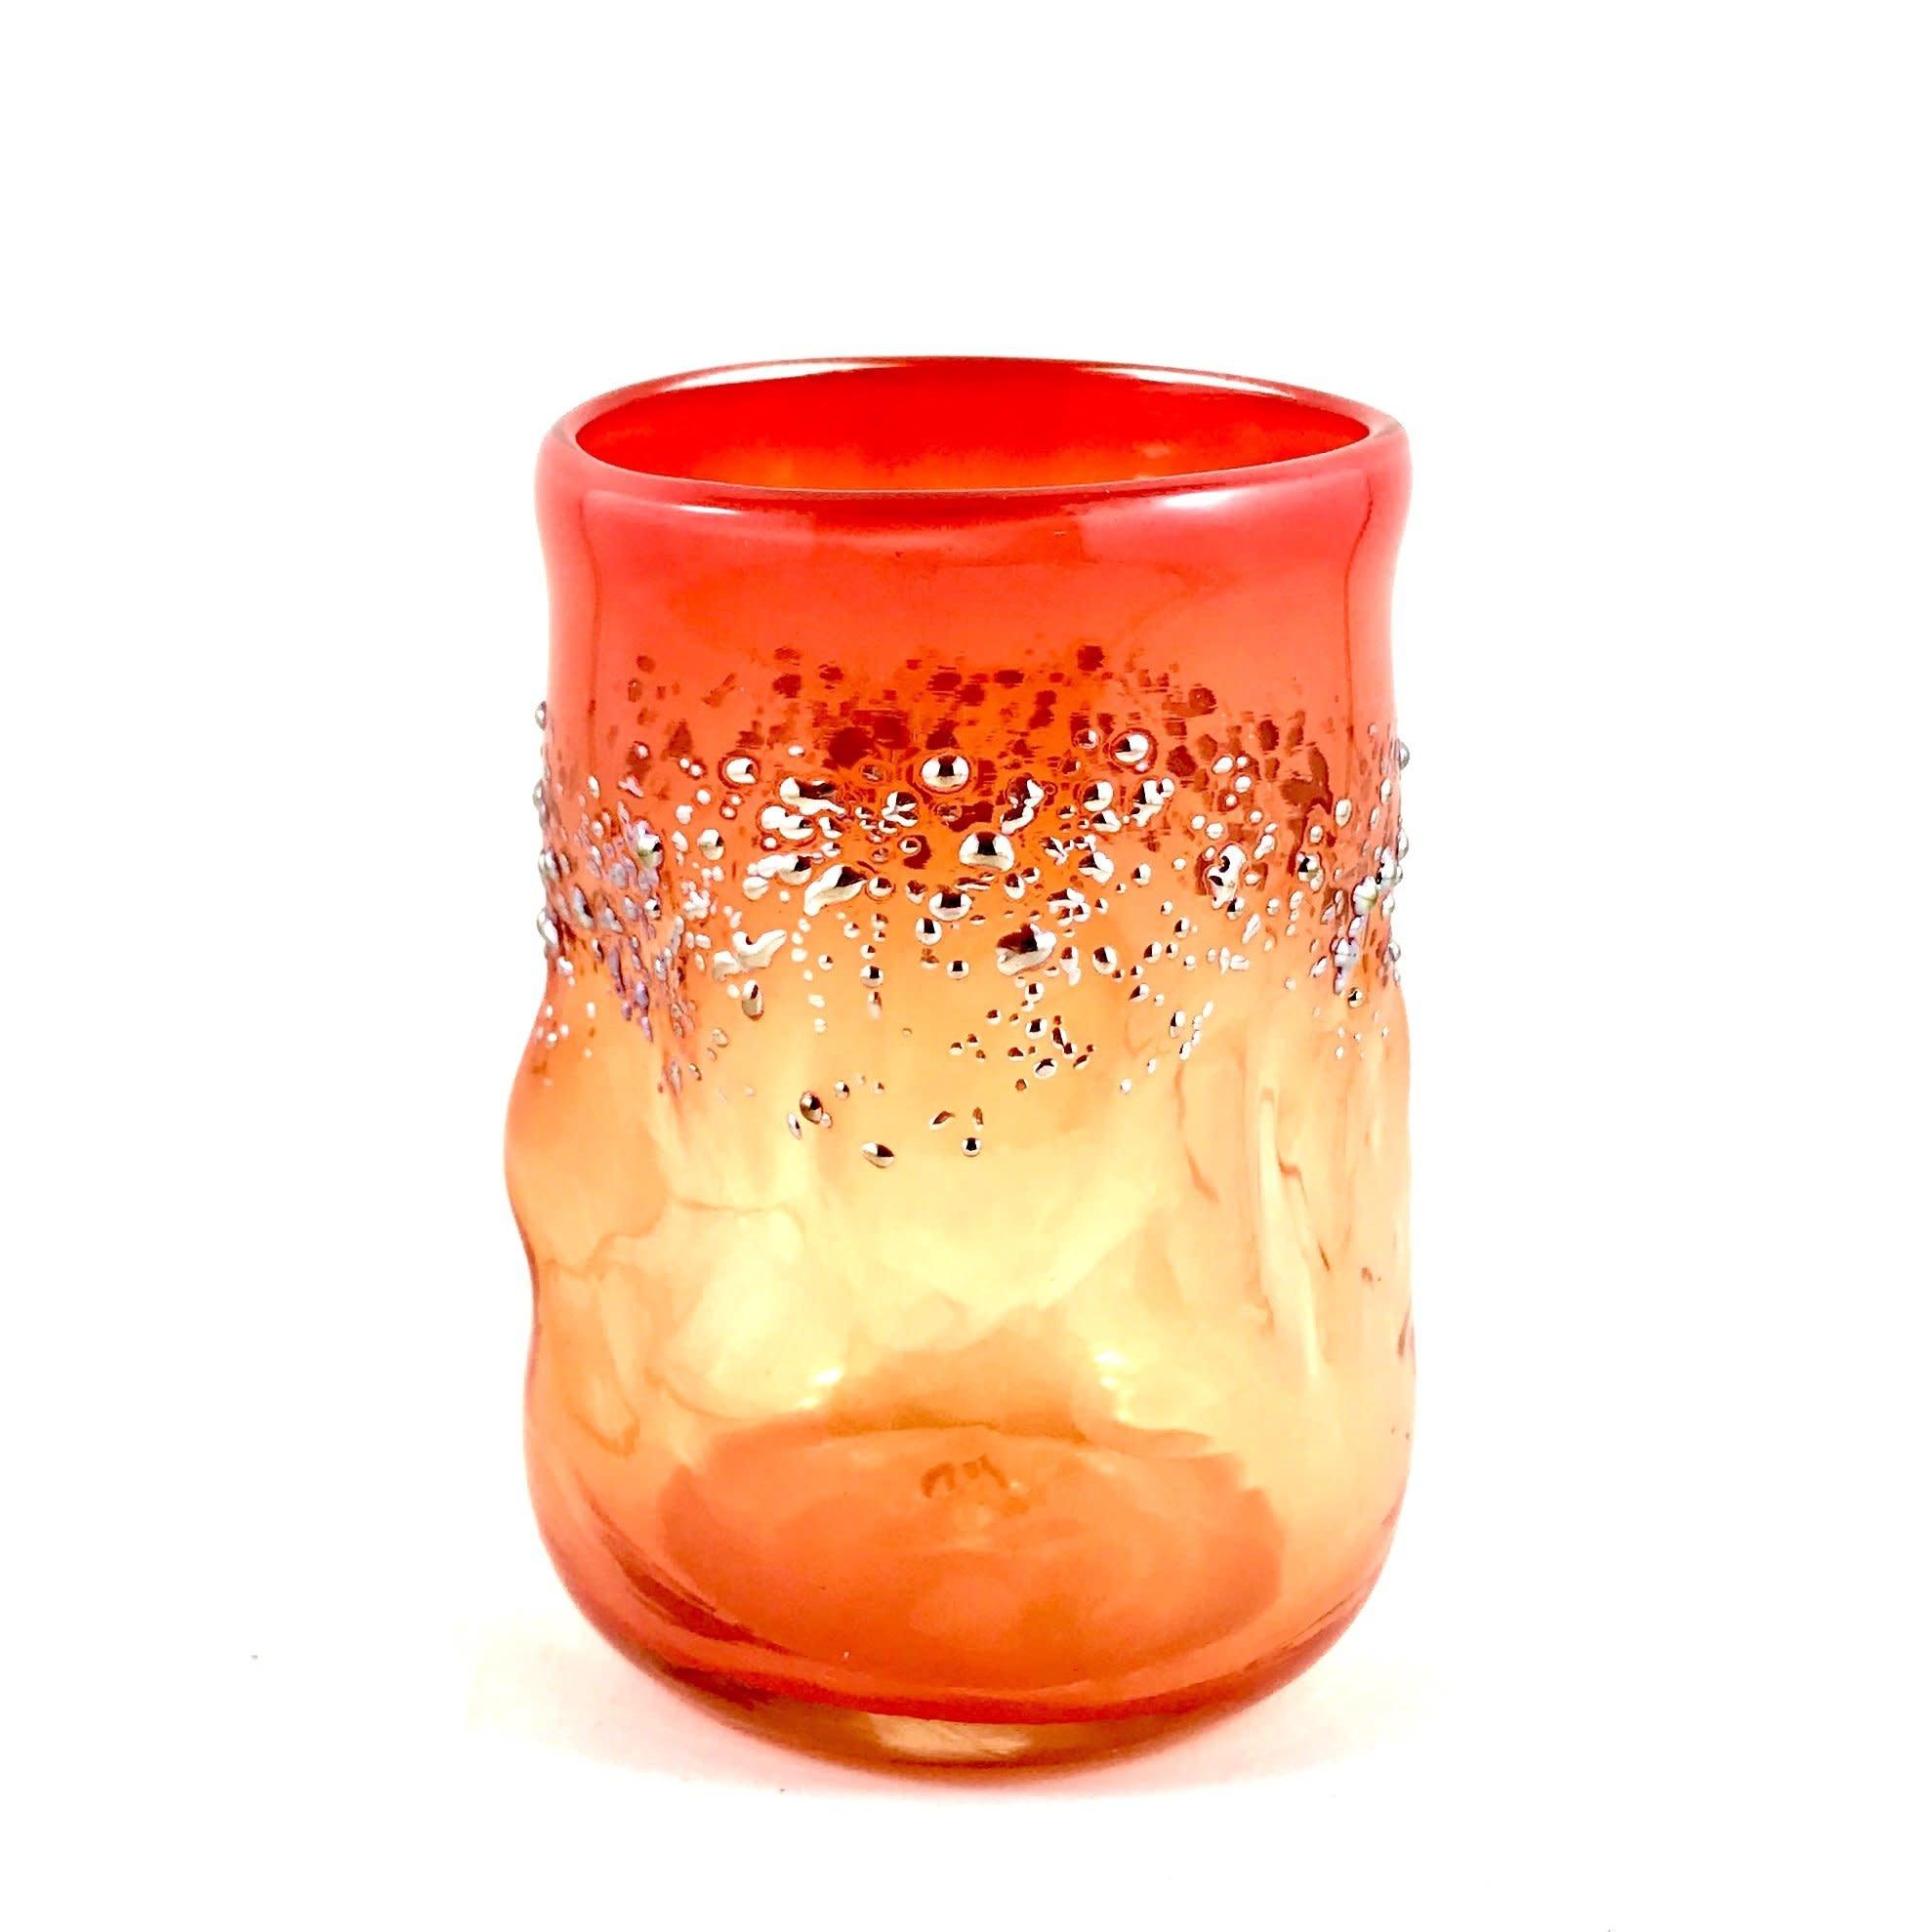 Warthog Glassworks - Ted Jolda Glitter Party Glass